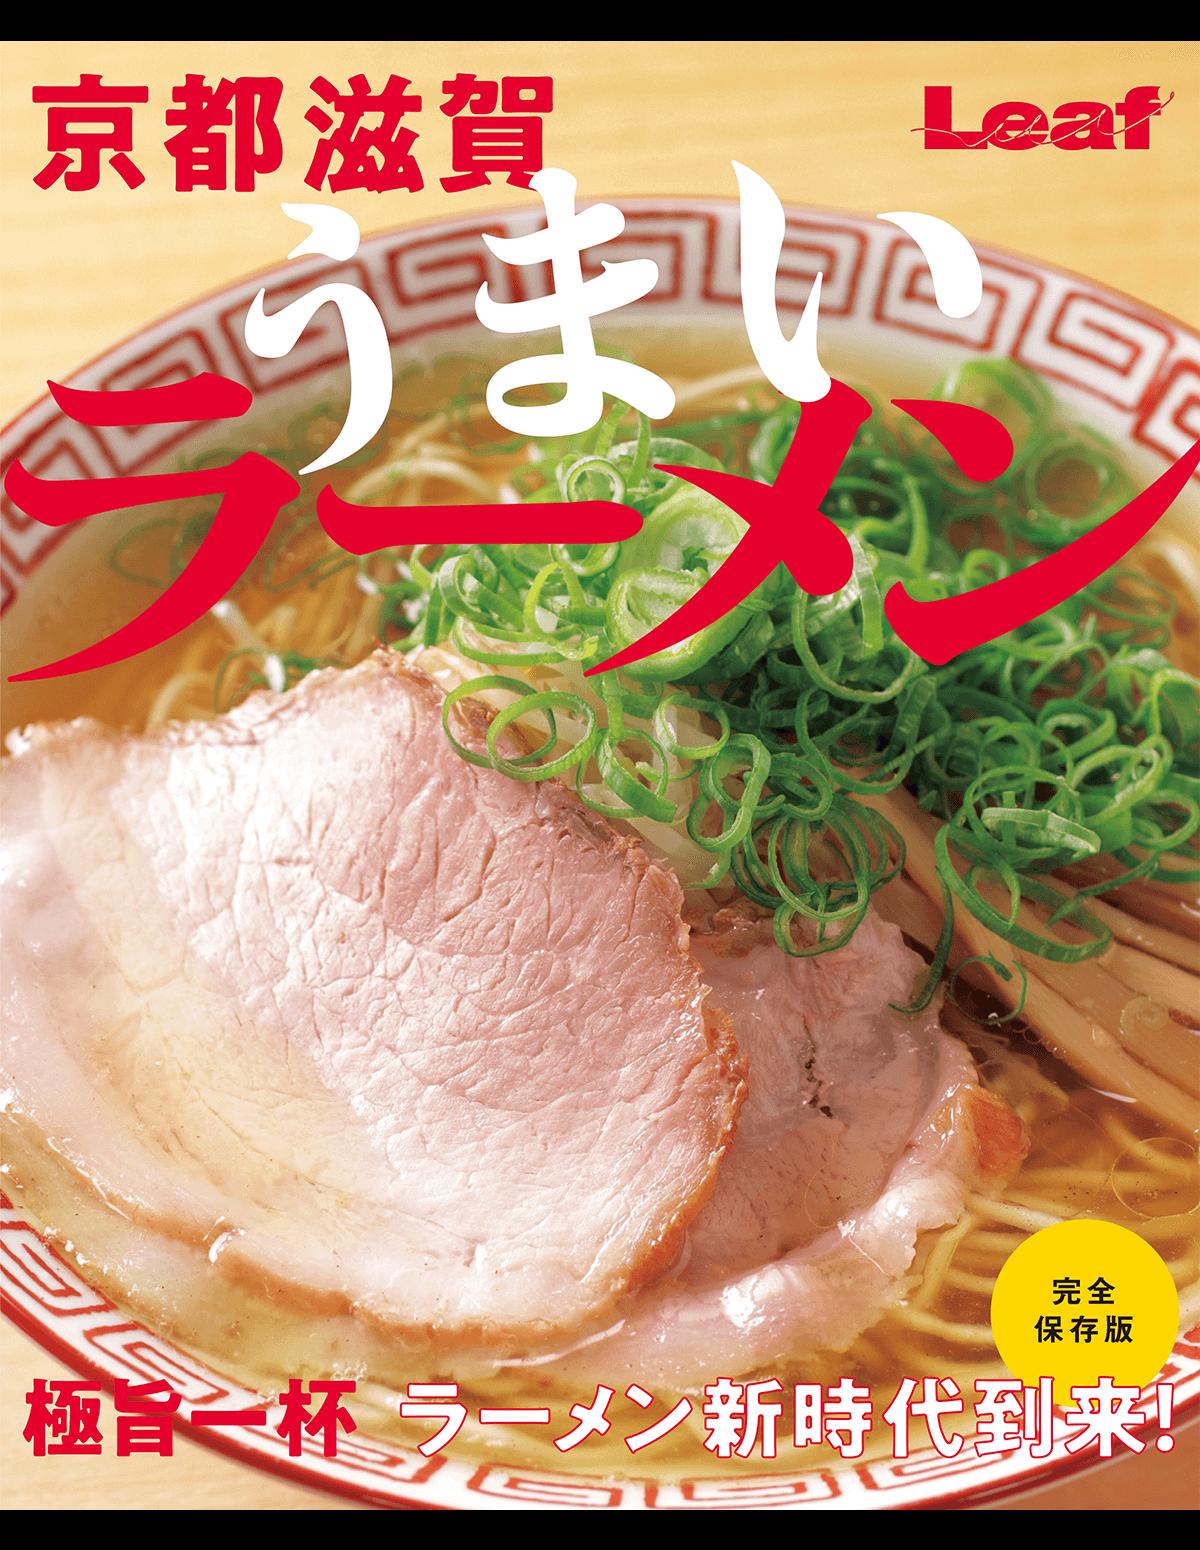 LeafMOOK 【書籍】京都 滋賀 うまいラーメン